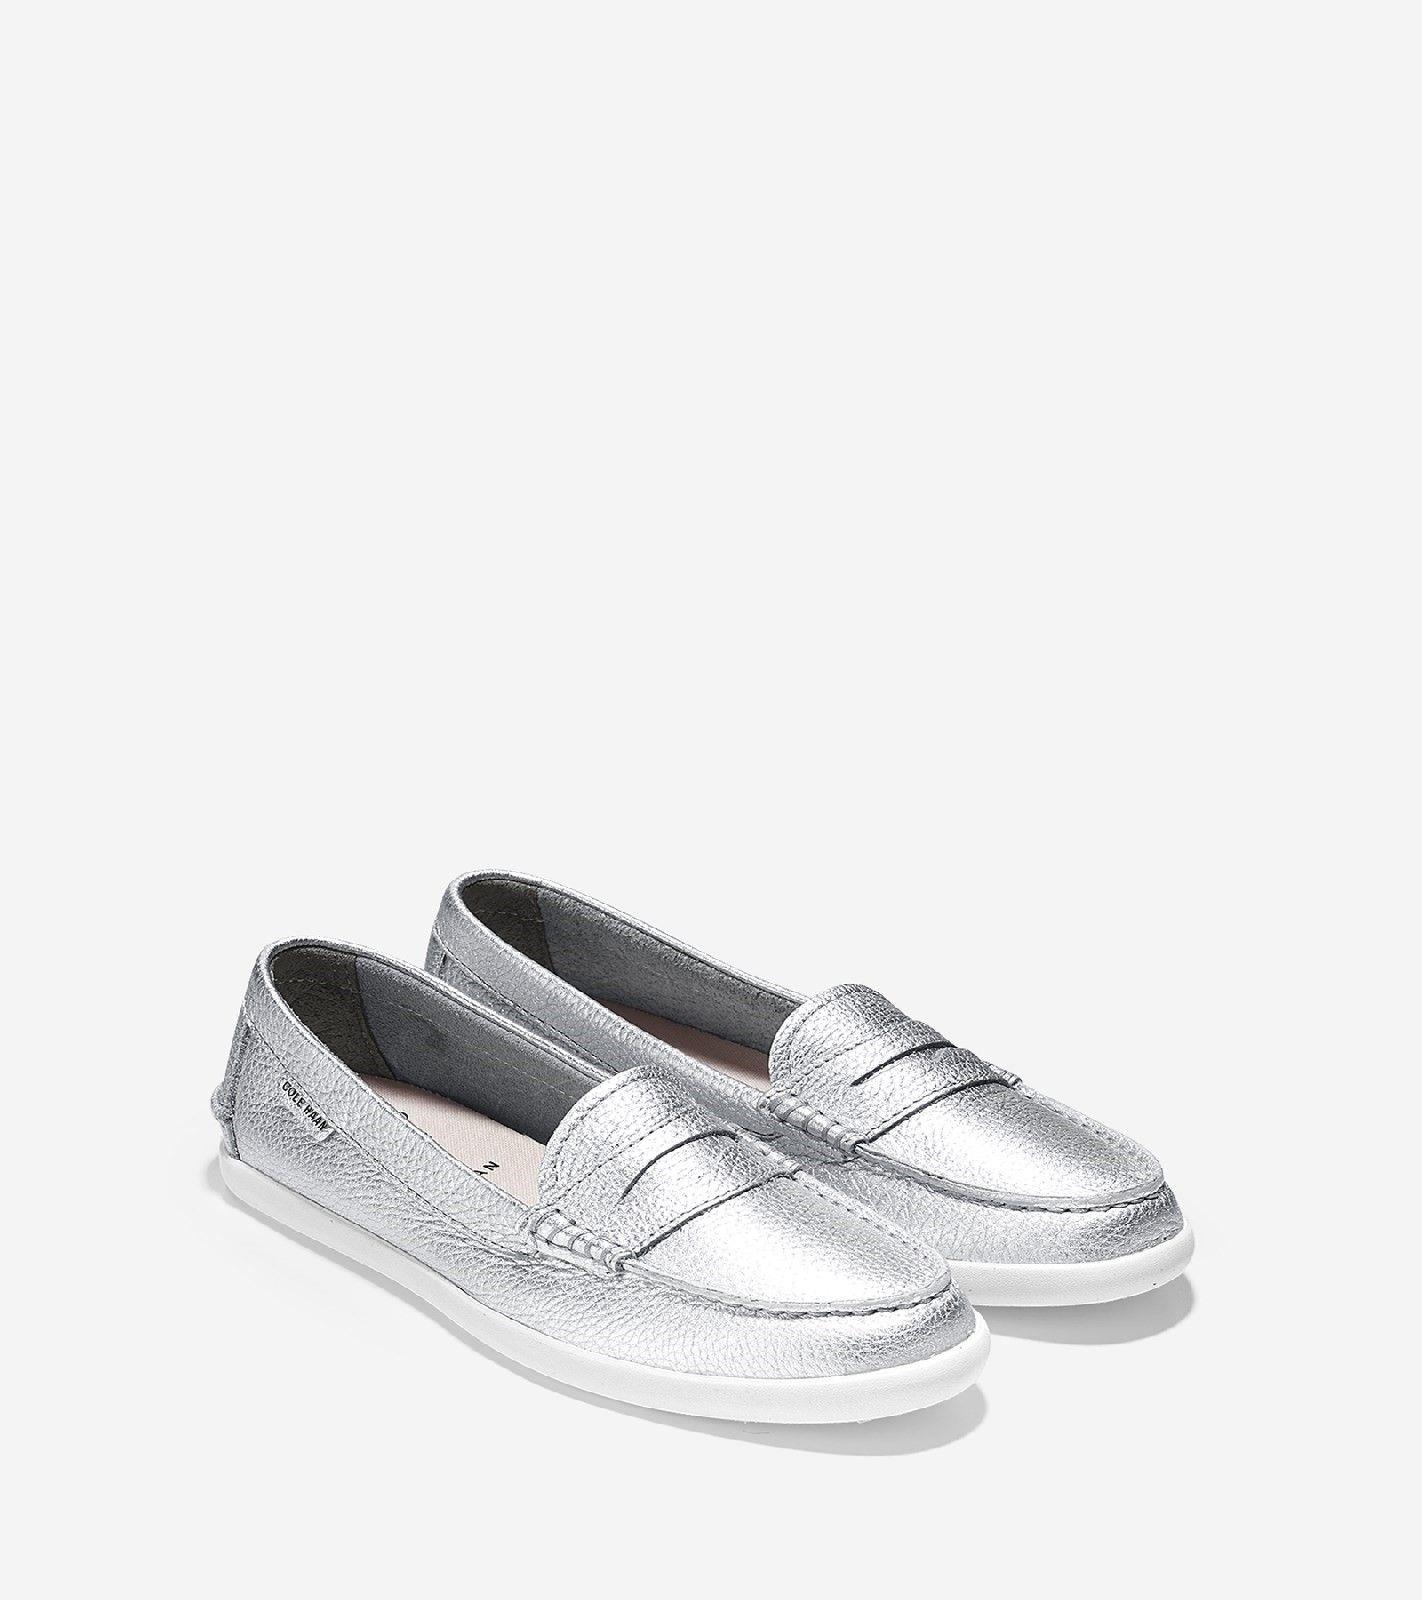 Pinch Weekender Loafer